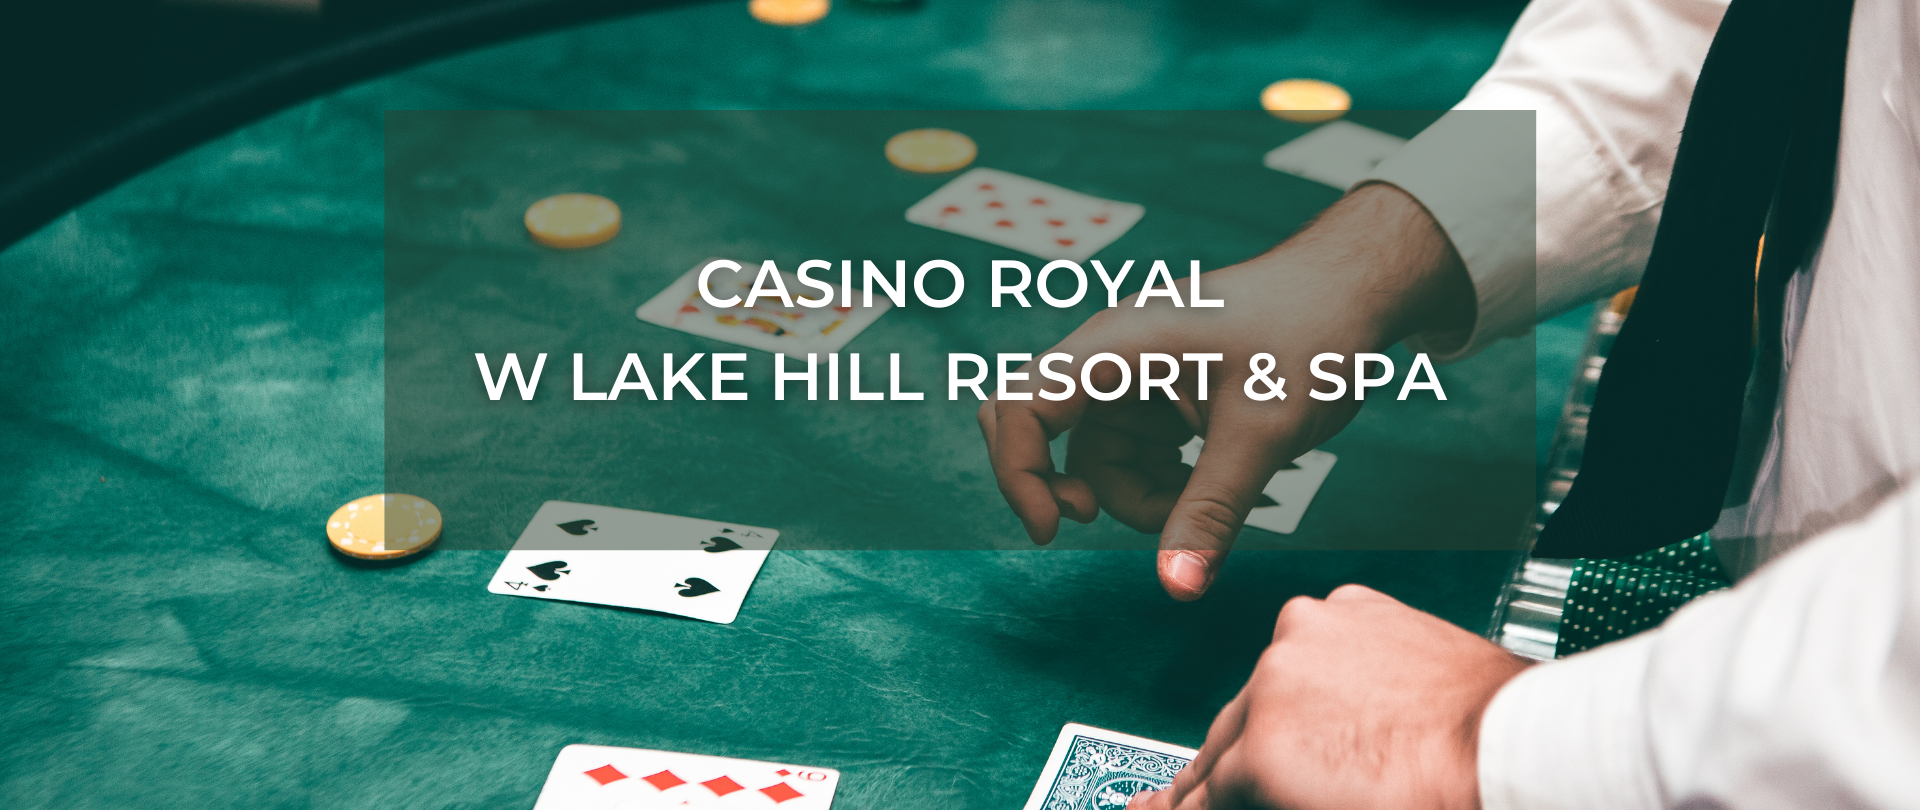 Casino Royal w Lake Hill Resort & SPA